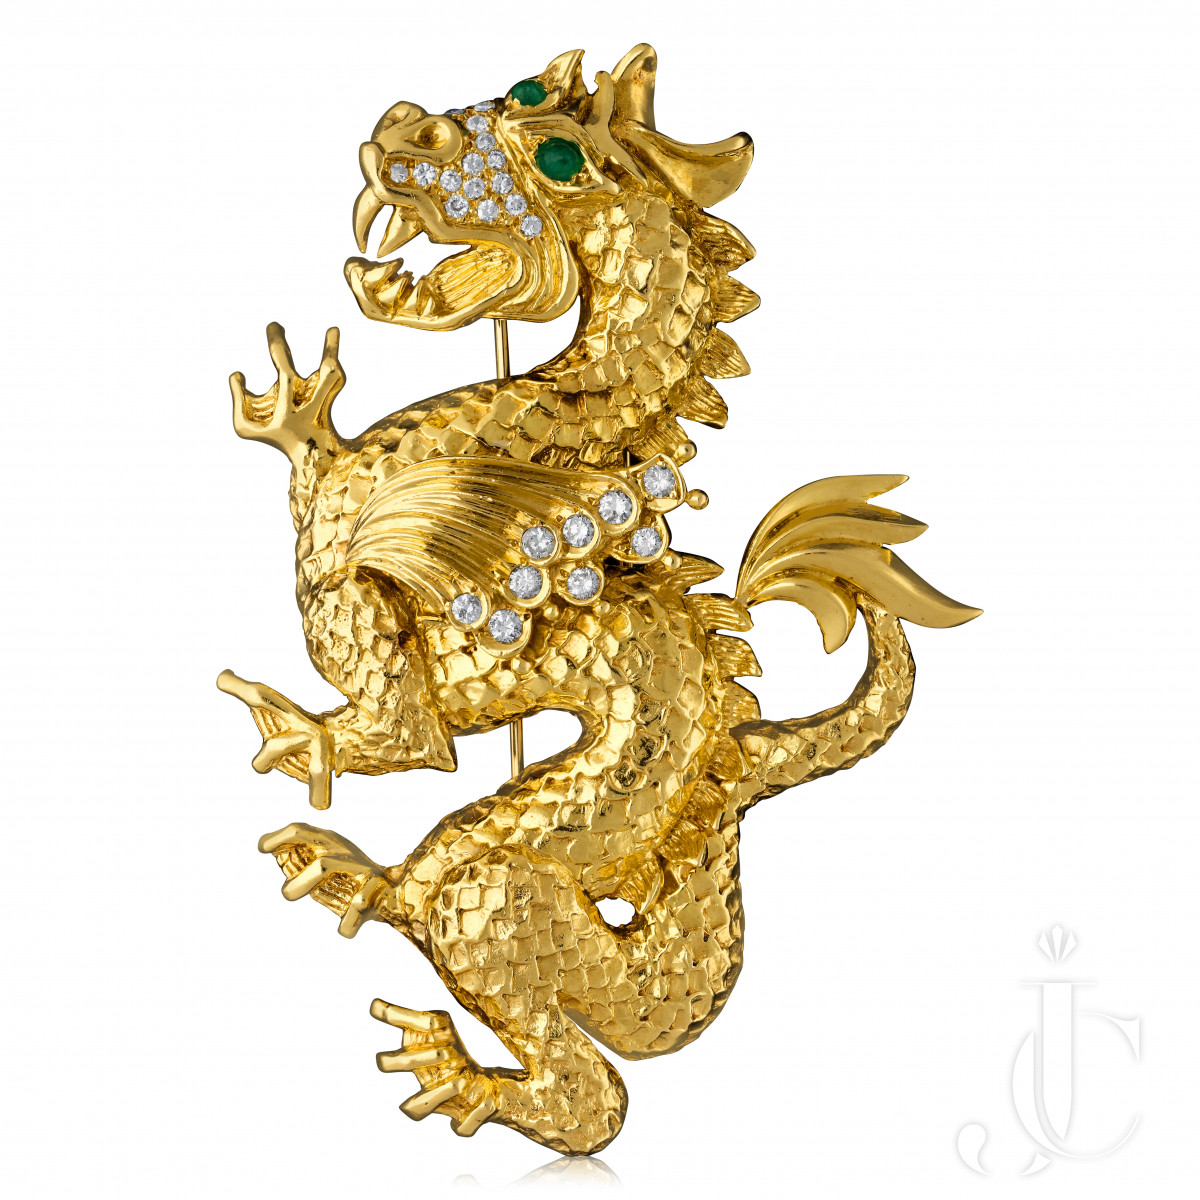 Van Cleef & Arpels- Large Gold/Diamond Emerald Dragon c.1969